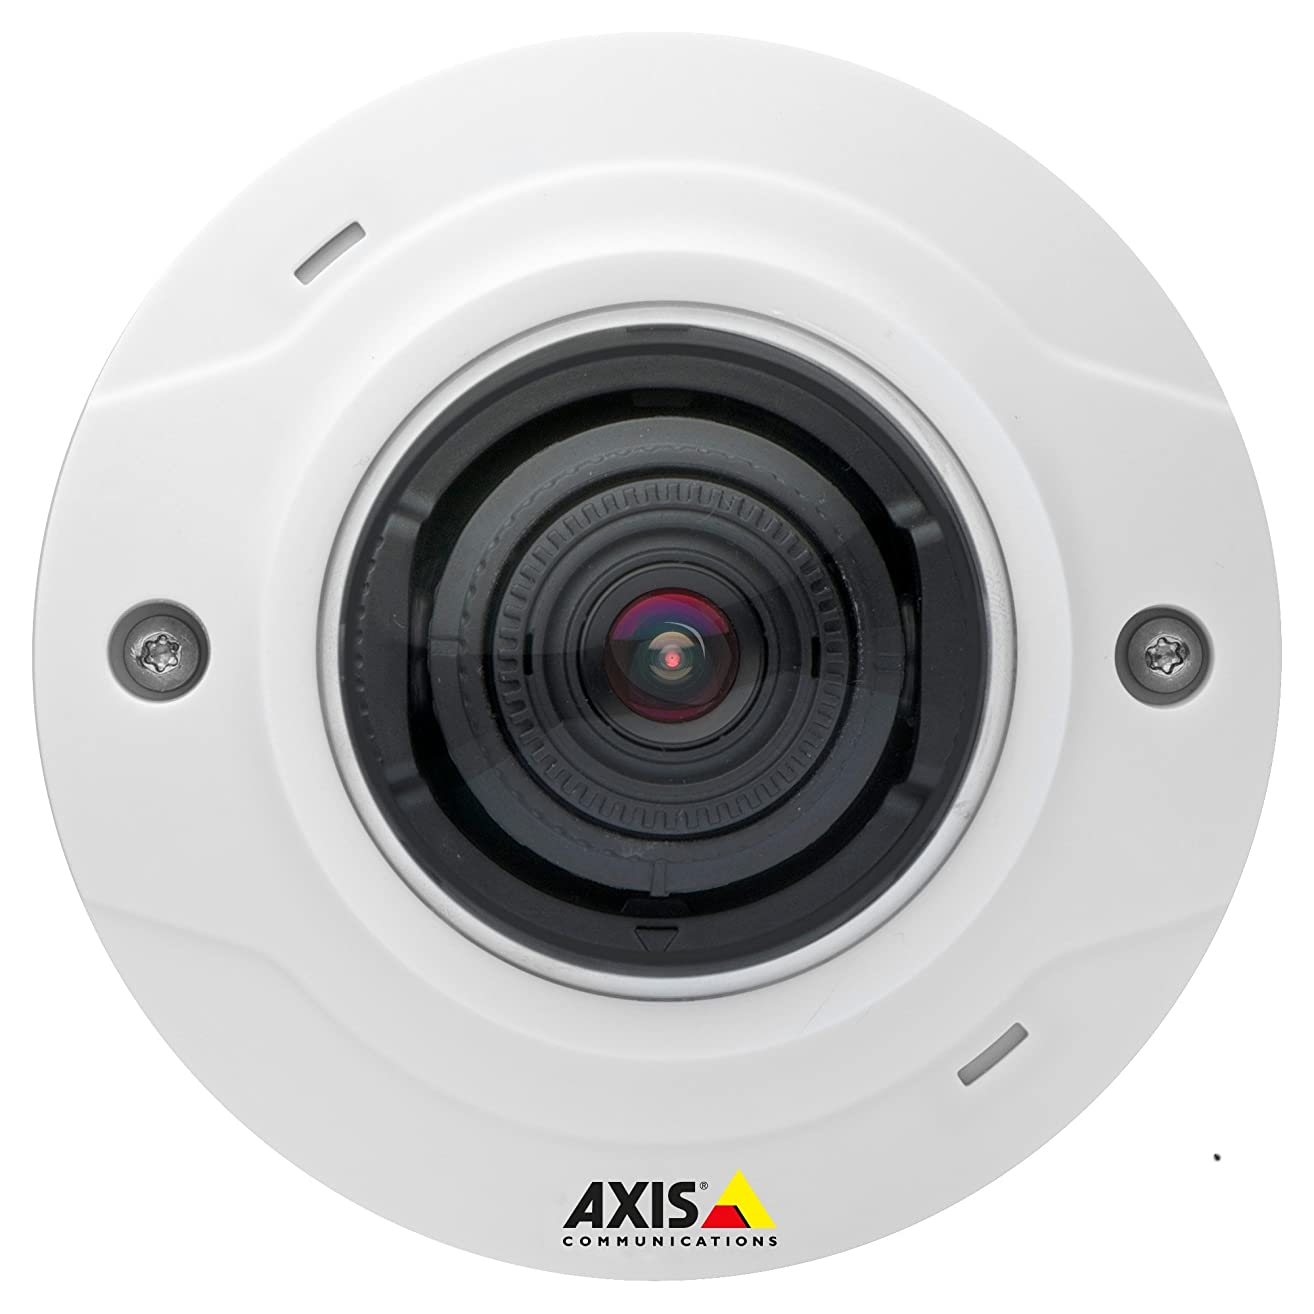 AXIS M3004-V Network Camera - Network camera - dome - dustproof / vandal-proof